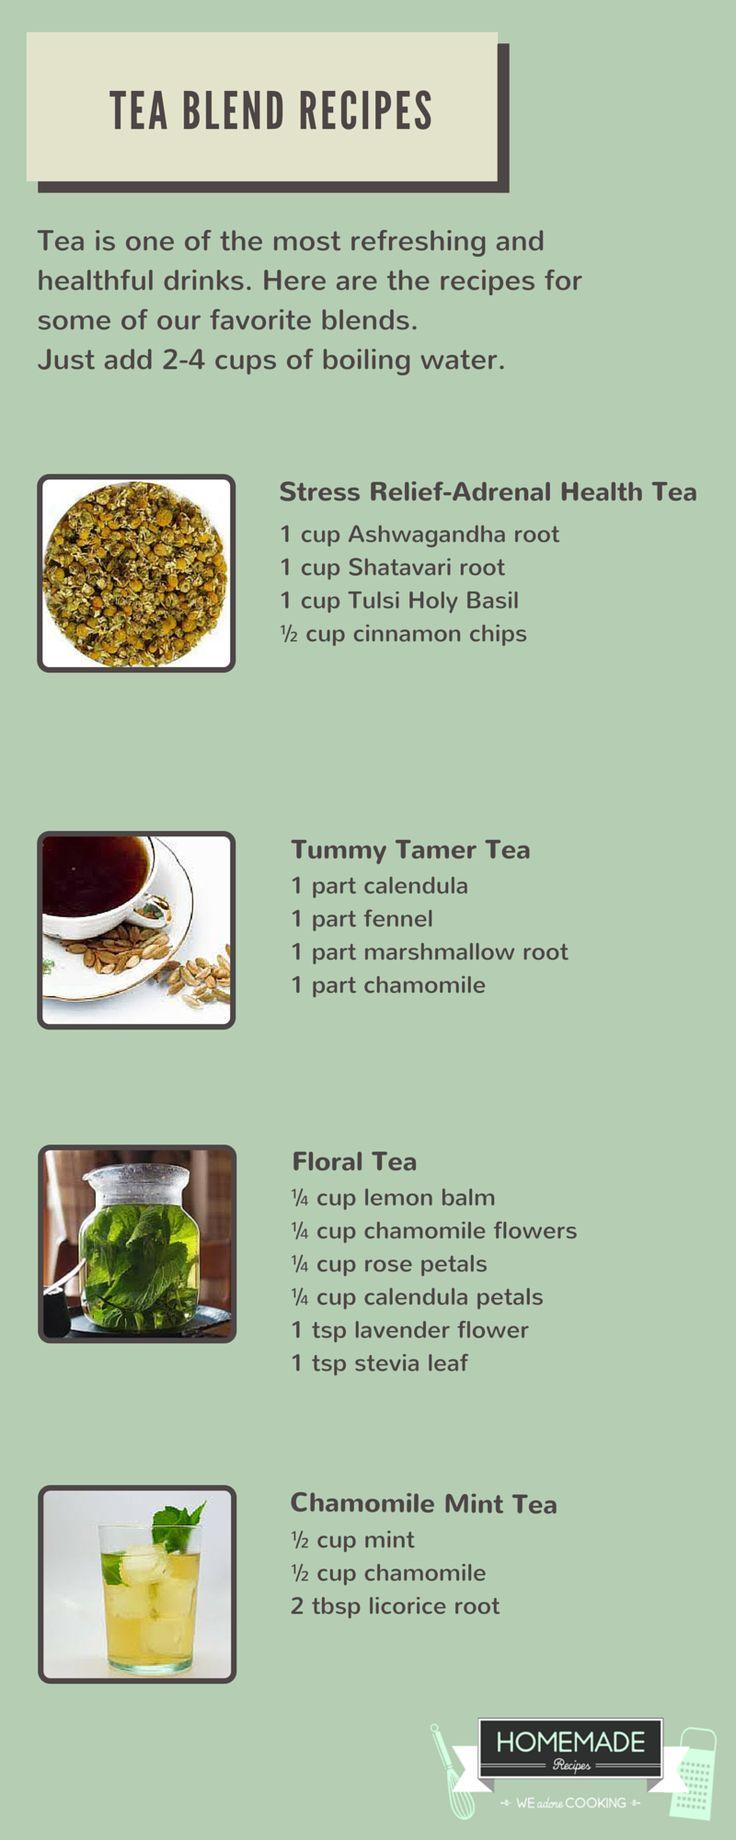 Blend gourmet herbal tea - Floral Tea Mint Tea Stress Relief Tea Blend Recipes By Homemade Recipes